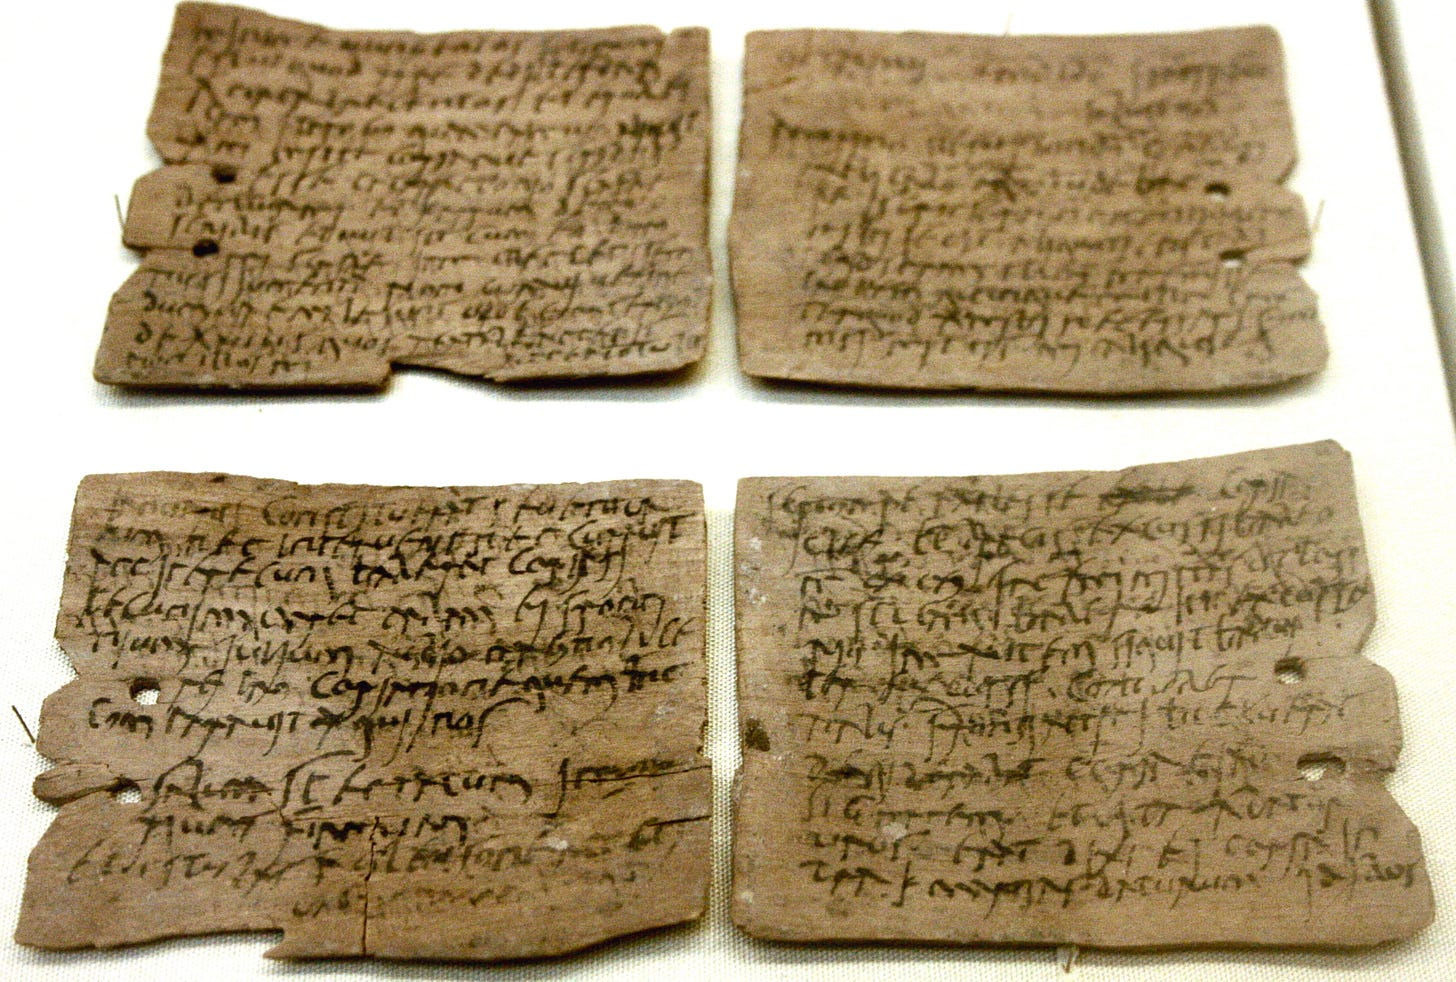 Vindolanda tablets - Wikipedia